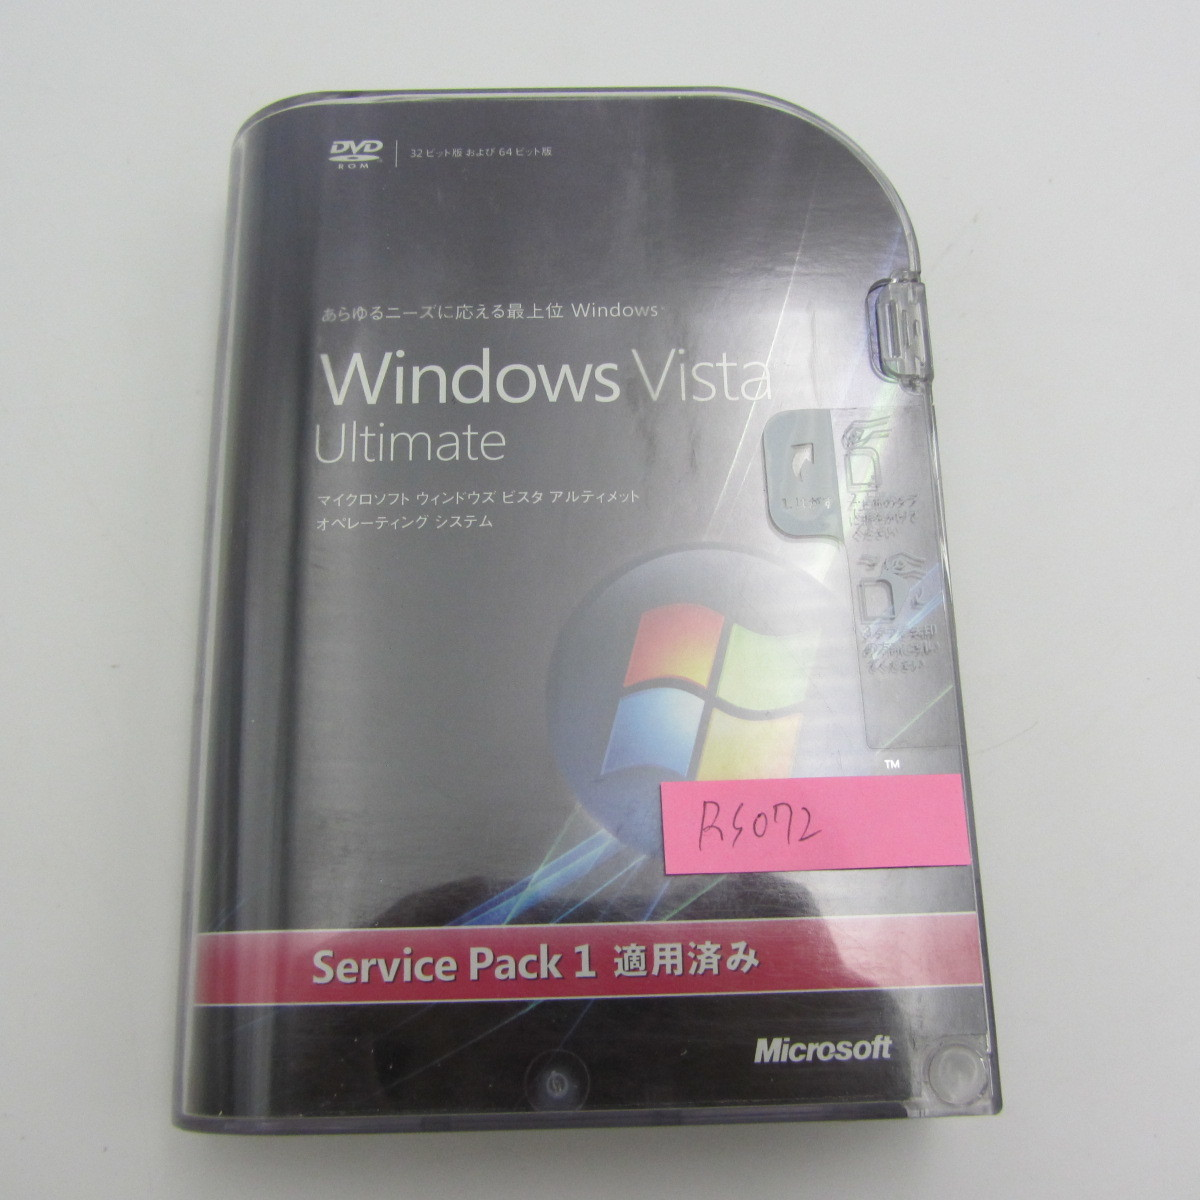 RS072●Windows Vista Ultimate Service Pack 1 適用済み SP1 /日本語 パッケージ版/32ビット 64ビット 32bit 64bit DVD2枚_画像2